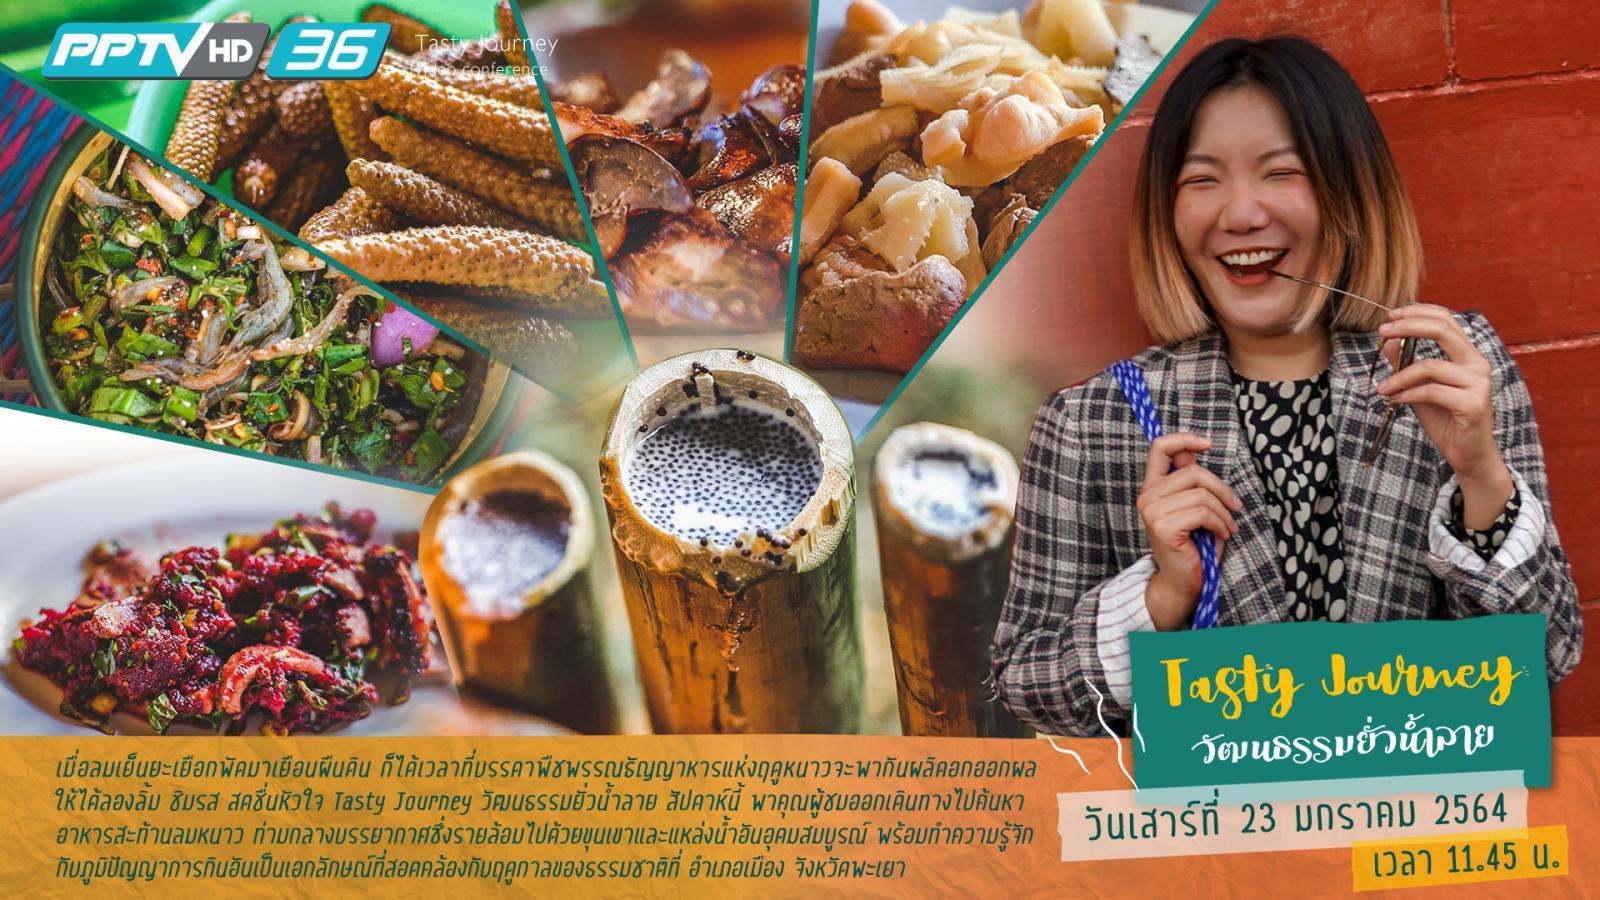 Tasty Journey วัฒนธรรมยั่วน้ำลาย | Eat Like The Local ตอนที่ 30